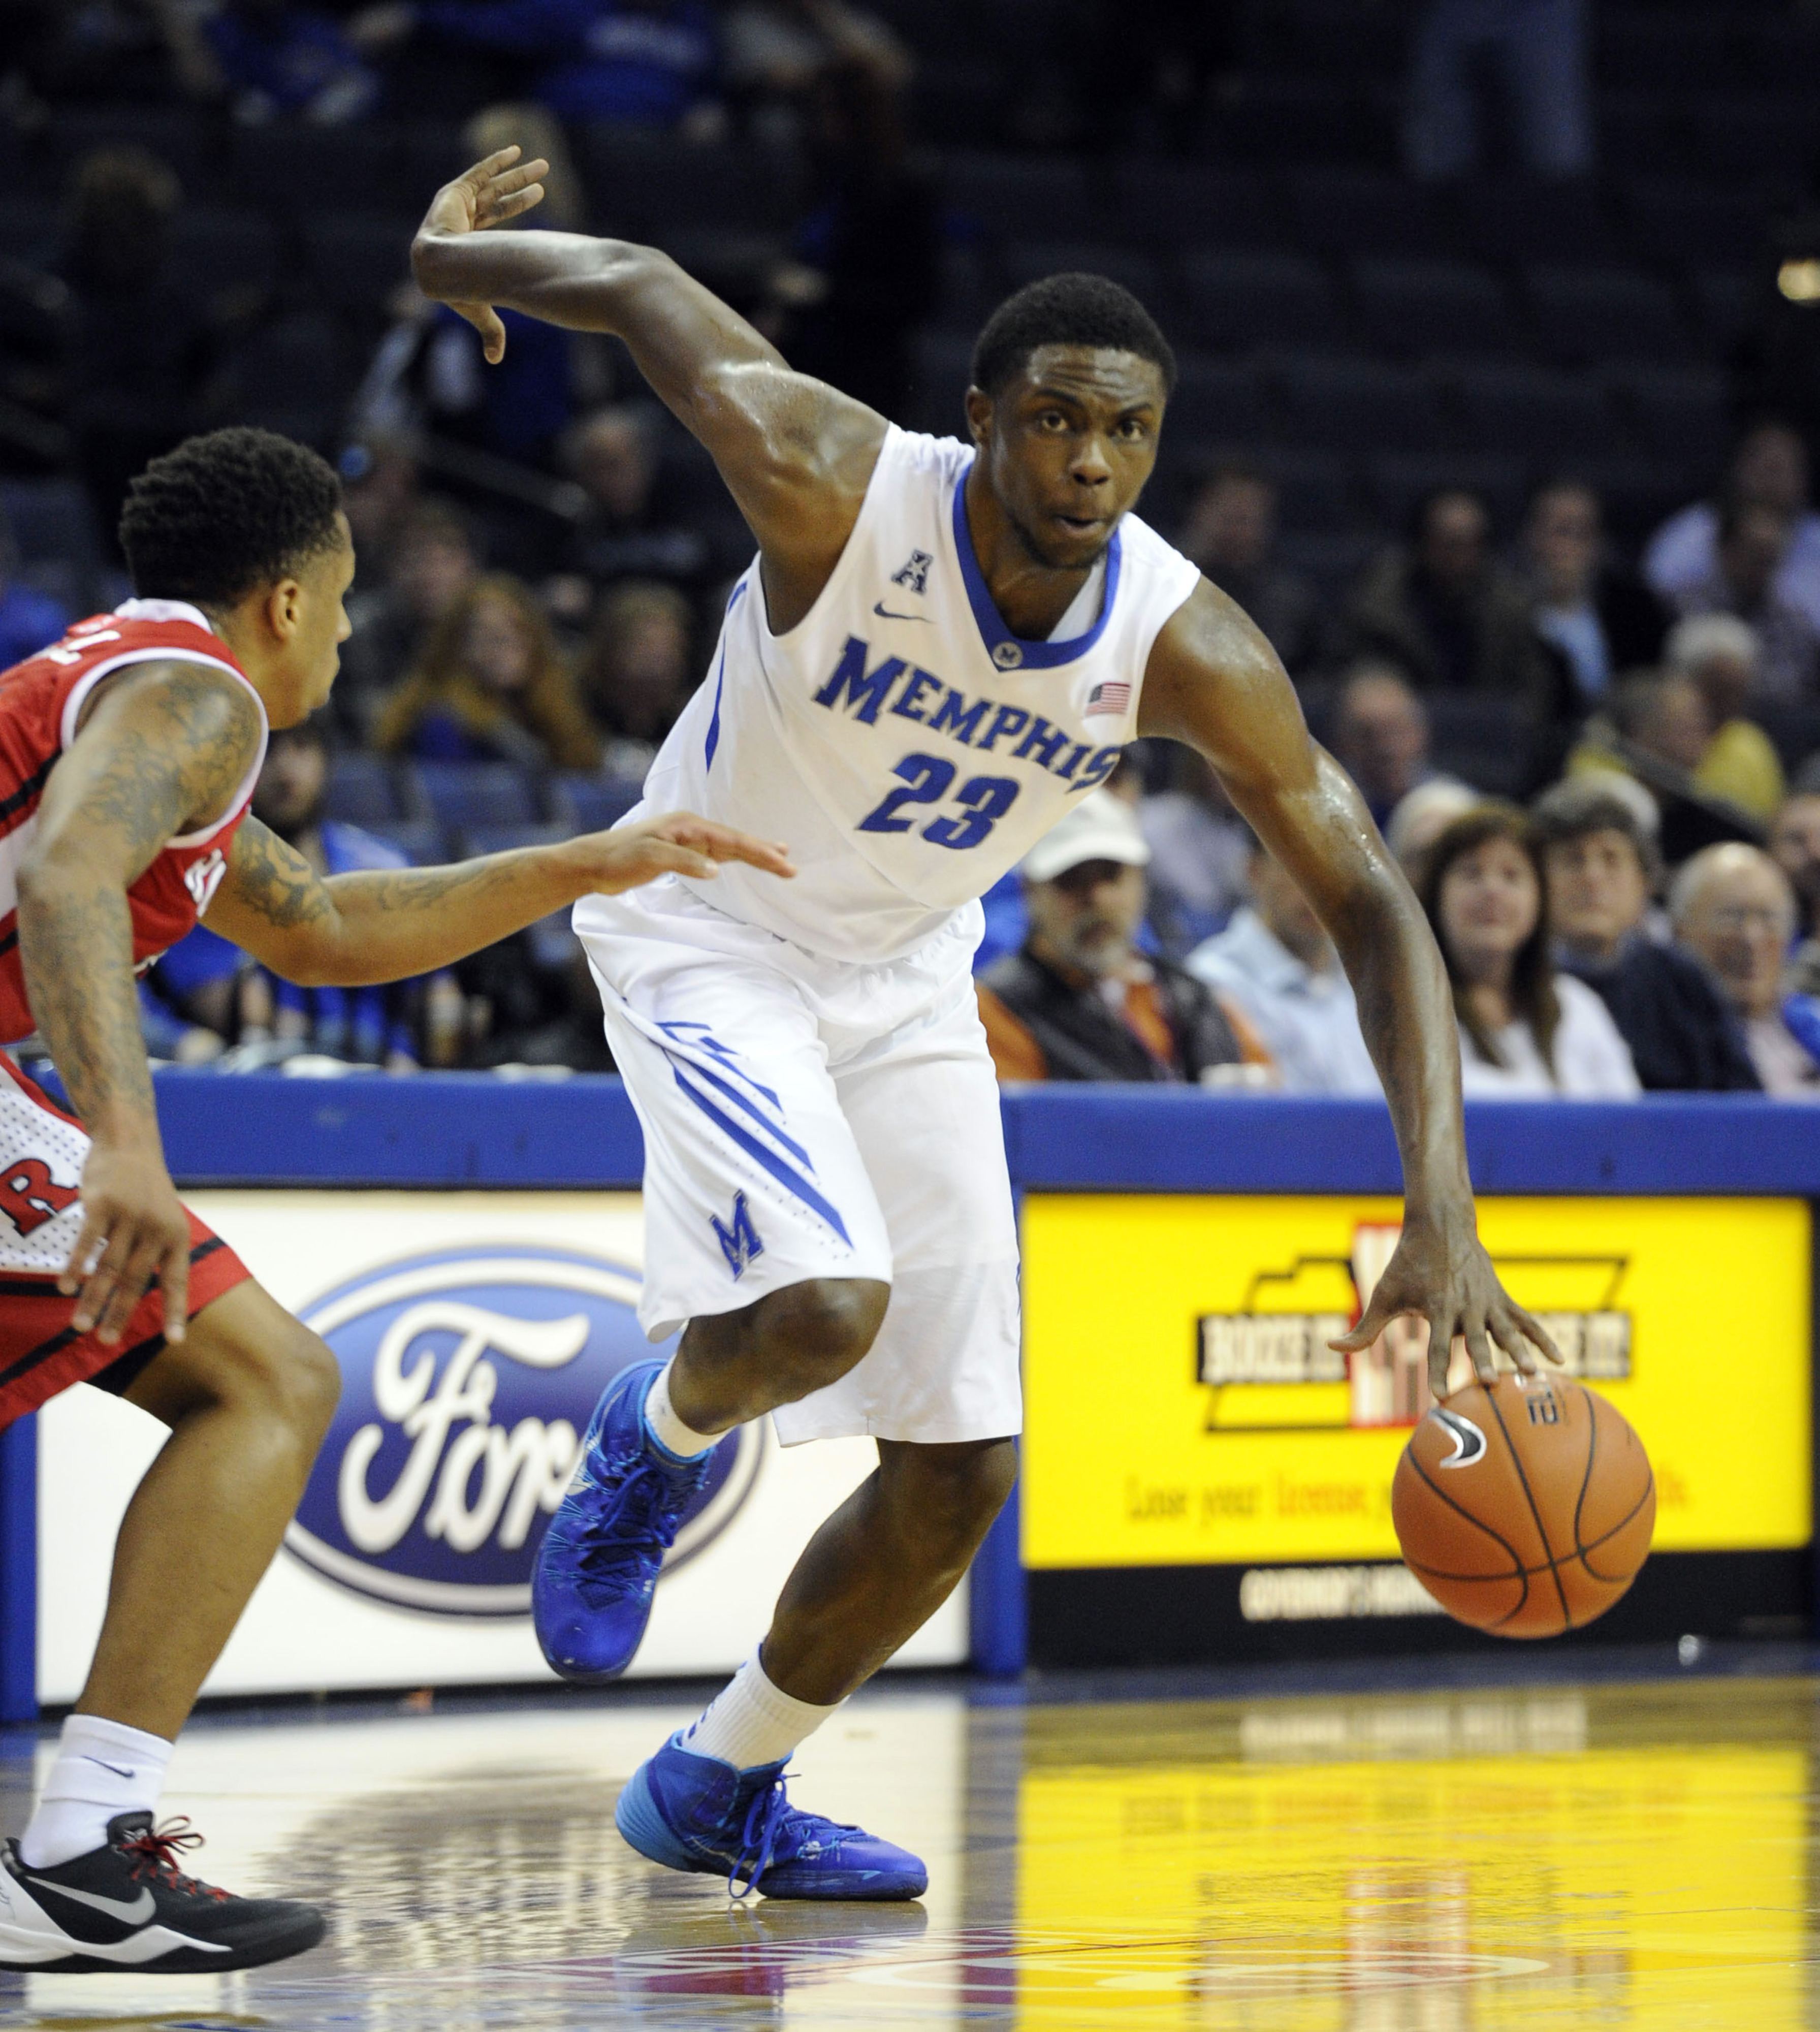 College basketball scores: Memphis pulls off comeback win over Gonzaga